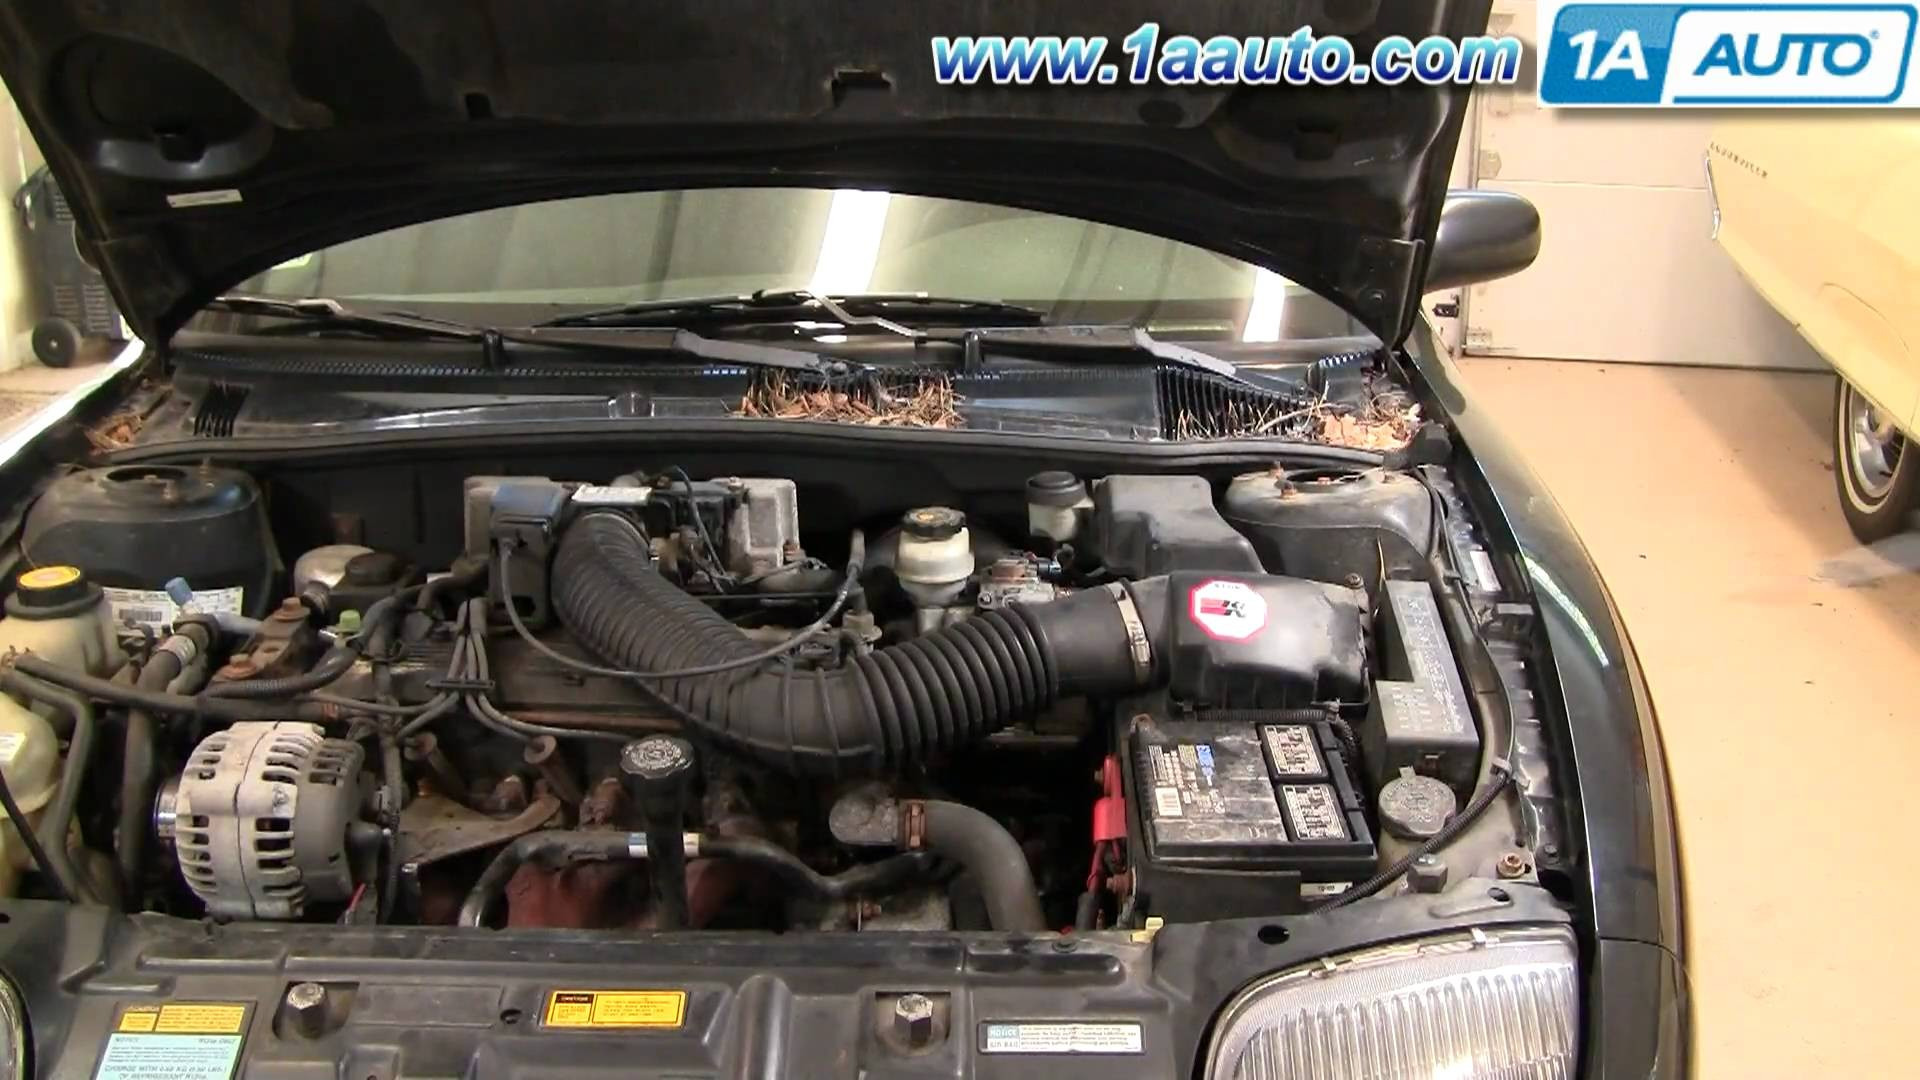 hight resolution of pontiac sunfire 2 2l engine best site wiring harness 2 2 liter chevrolet engine diagram 2000 pontiac montana engine diagram